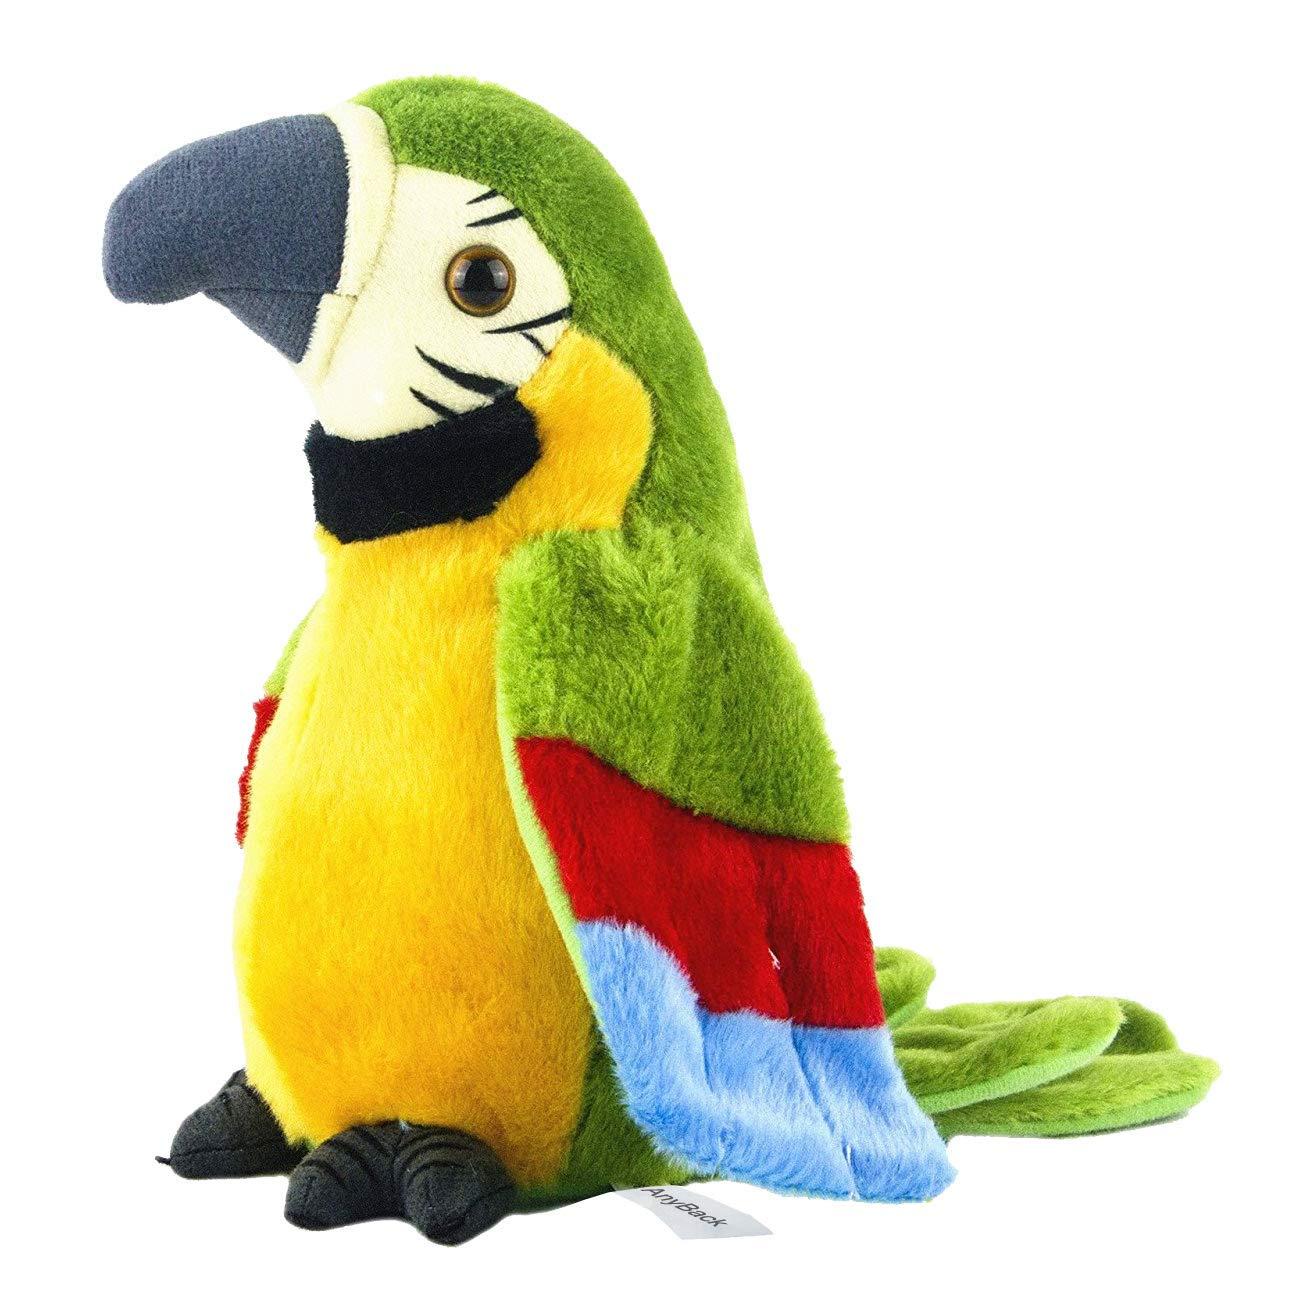 AnyBack Talking Parrot 5179cc5726